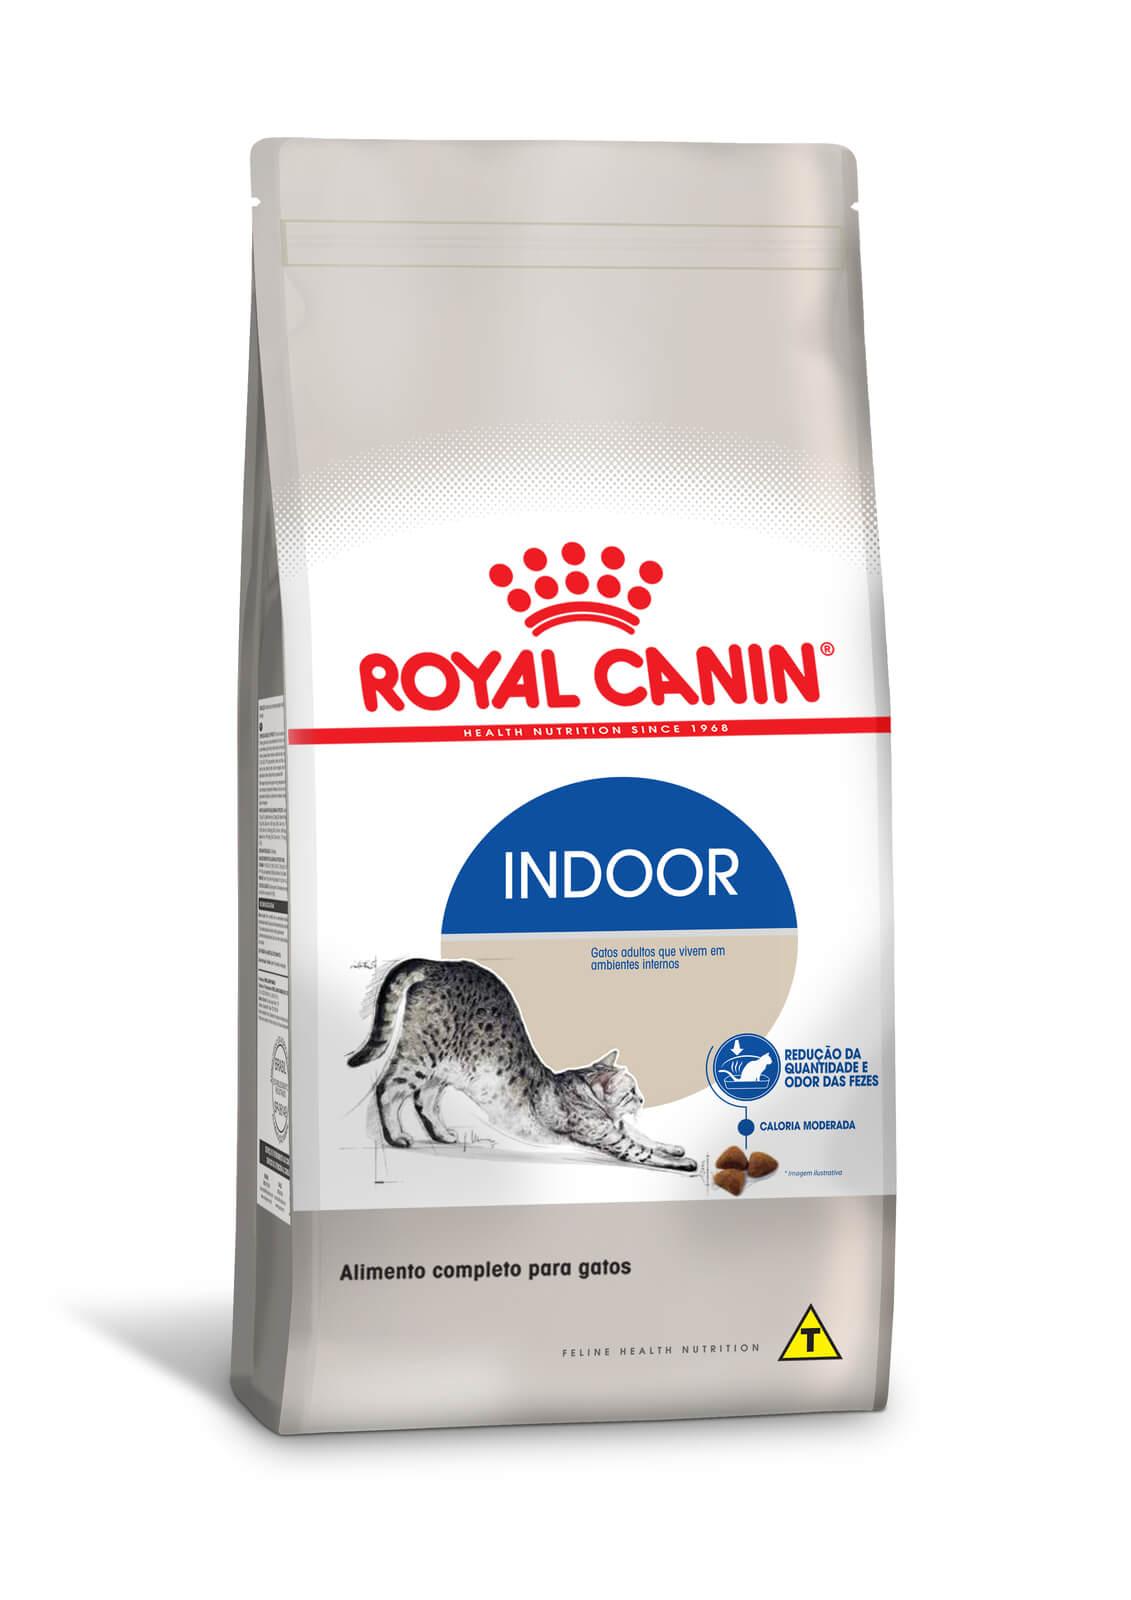 Ração Royal Canin Indoor - Gatos Adultos - 1,5 kg